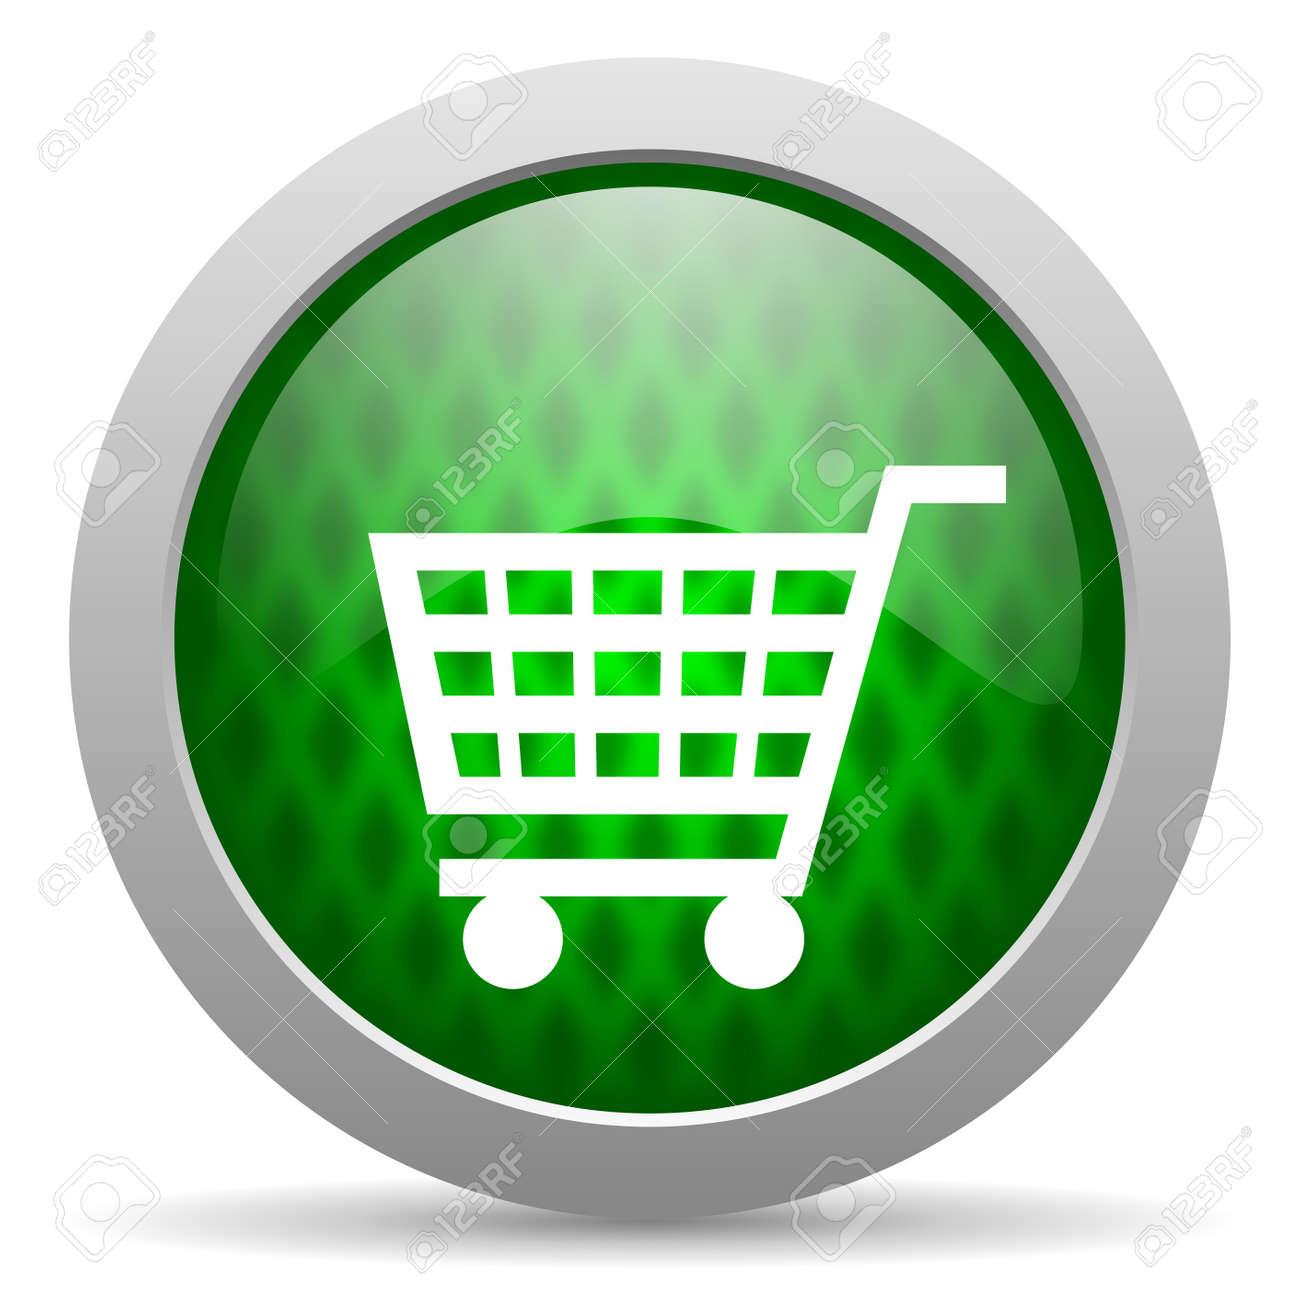 shopping cart icon Stock Photo - 15417407